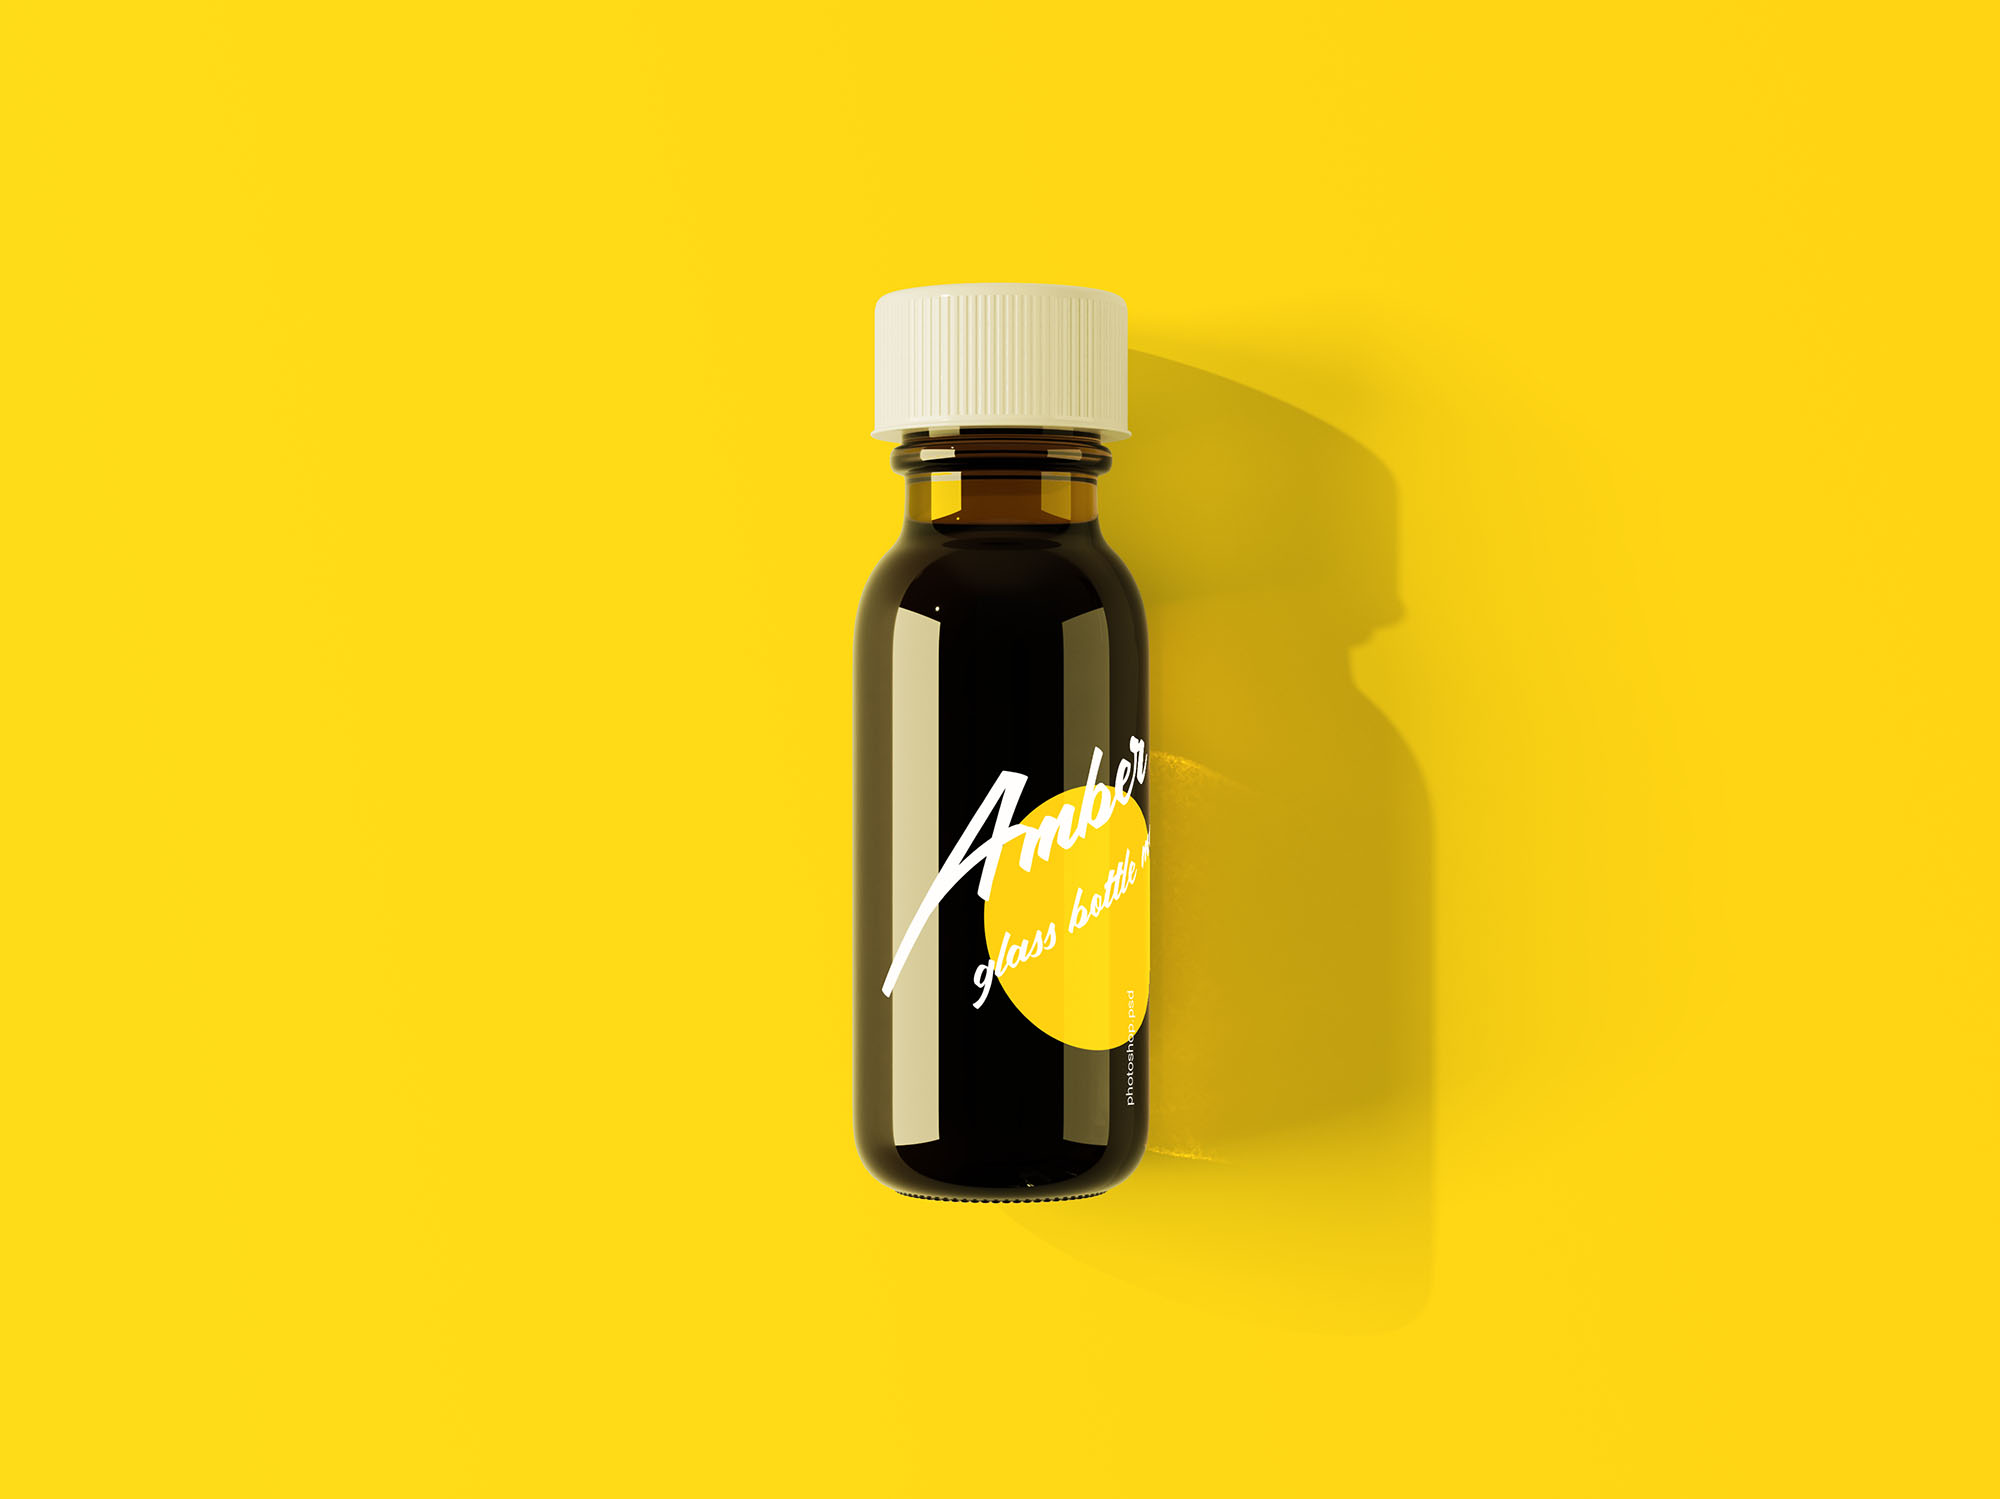 Amber Glass Mini Bottle Mockup